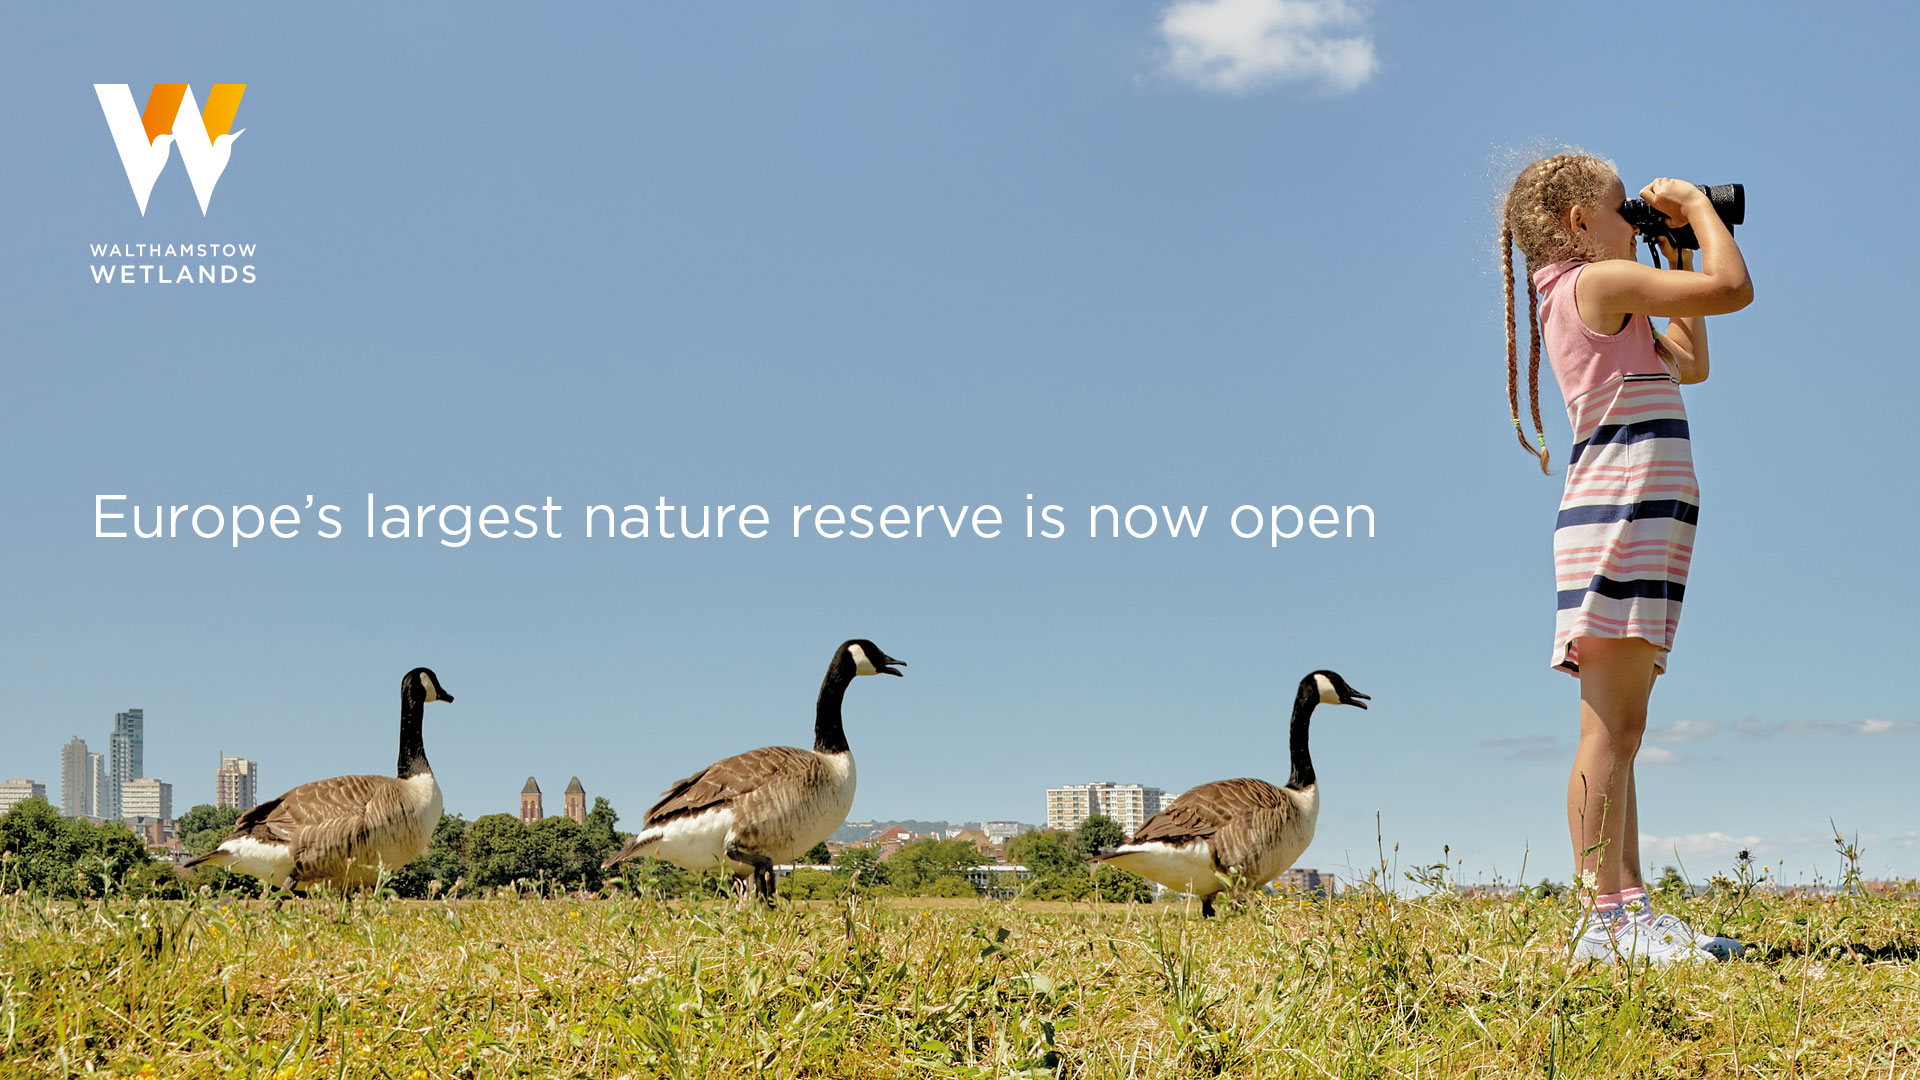 Walthamstow Wetlands